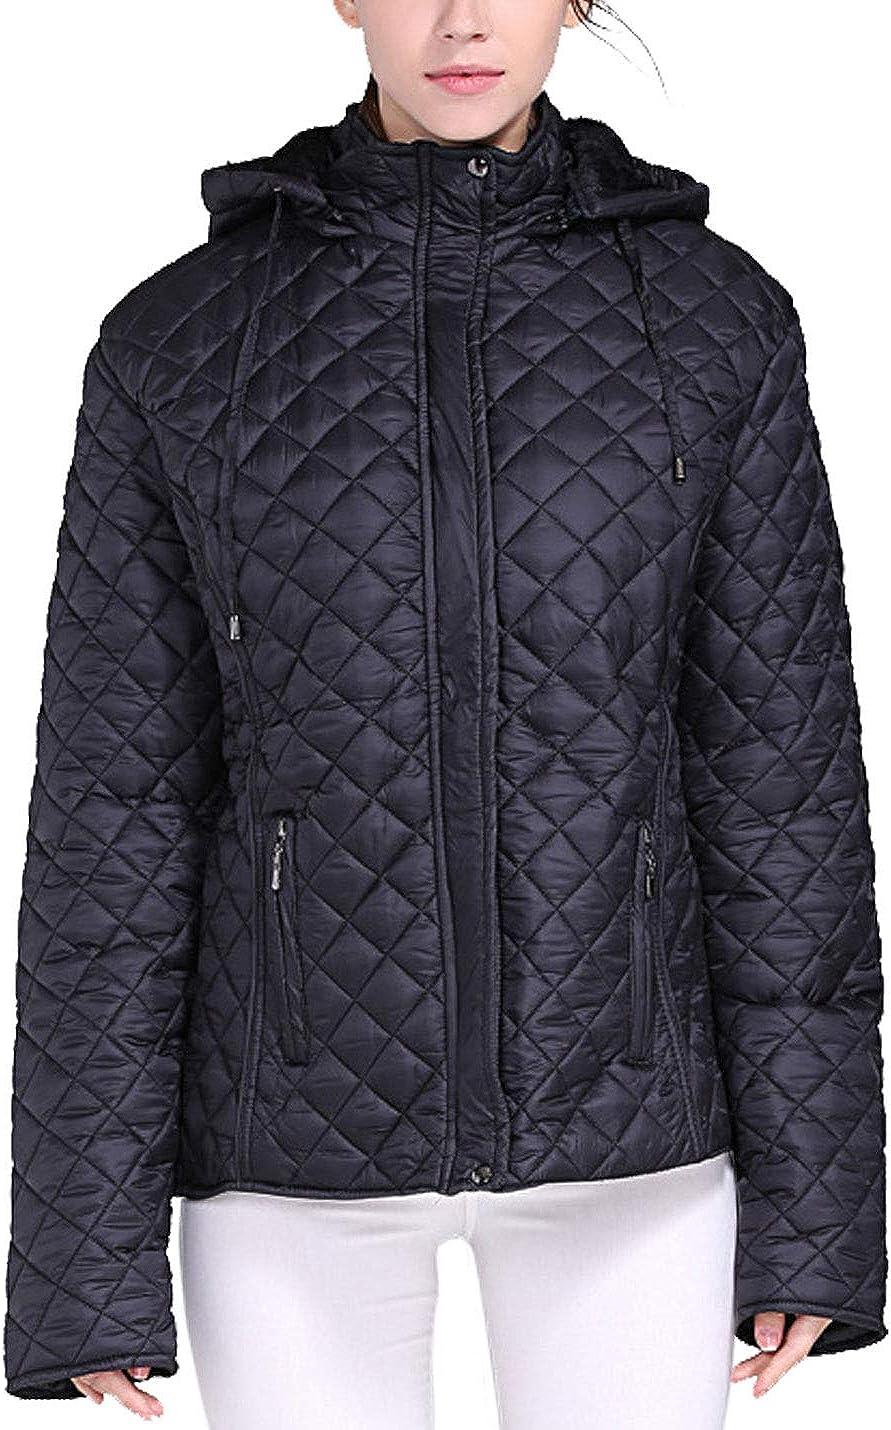 Flygo Women's Winter Plus Size Warm Quilted Down Parka Jacket Outwear